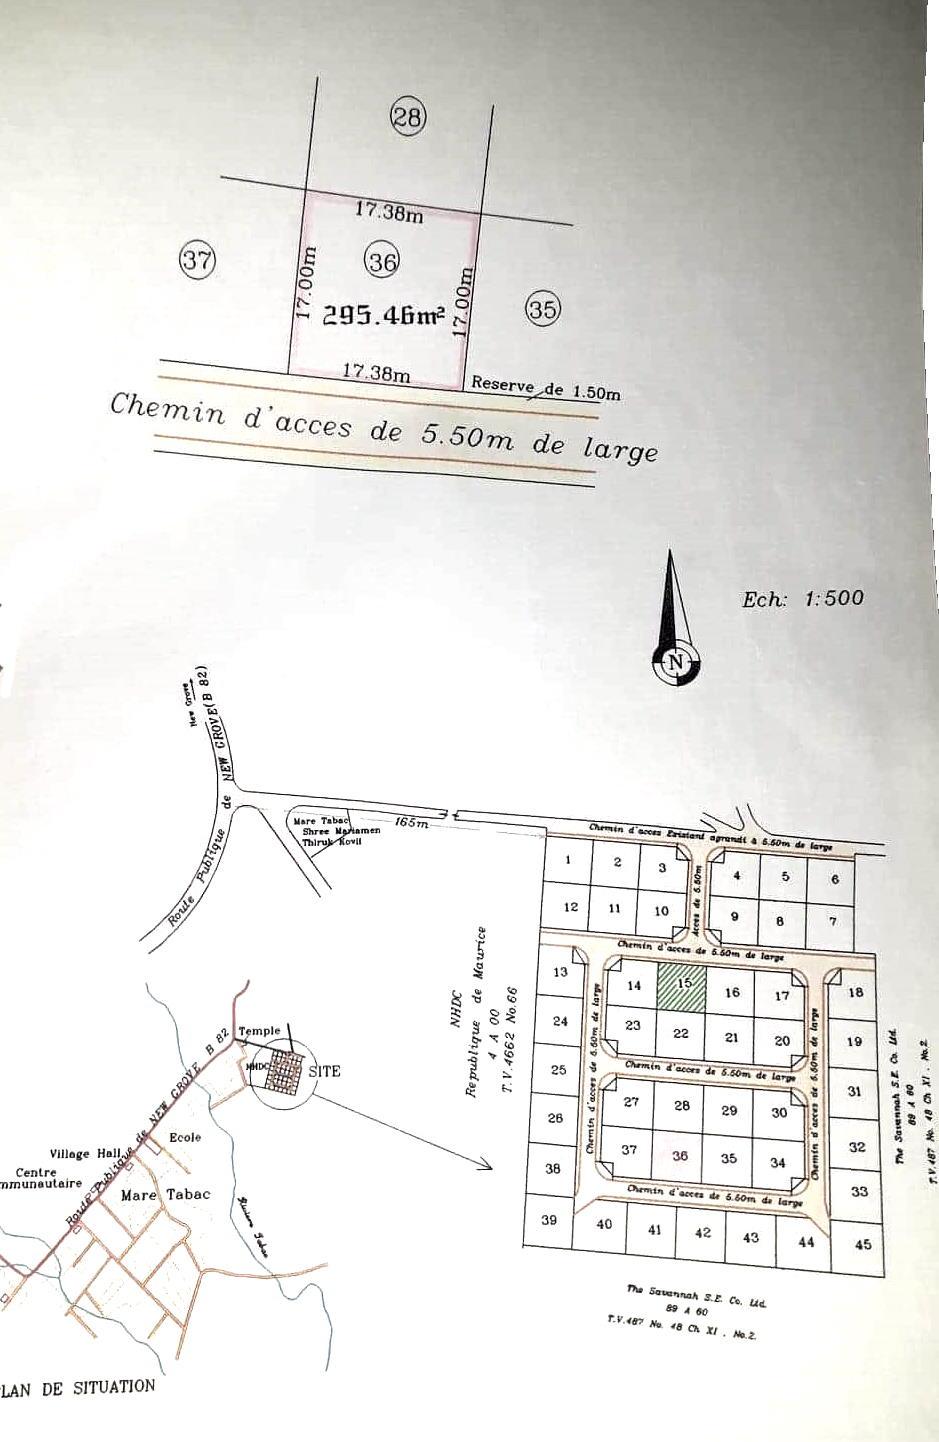 Residencialland for sale atRose Belle, Morcellement Mare Tabac.